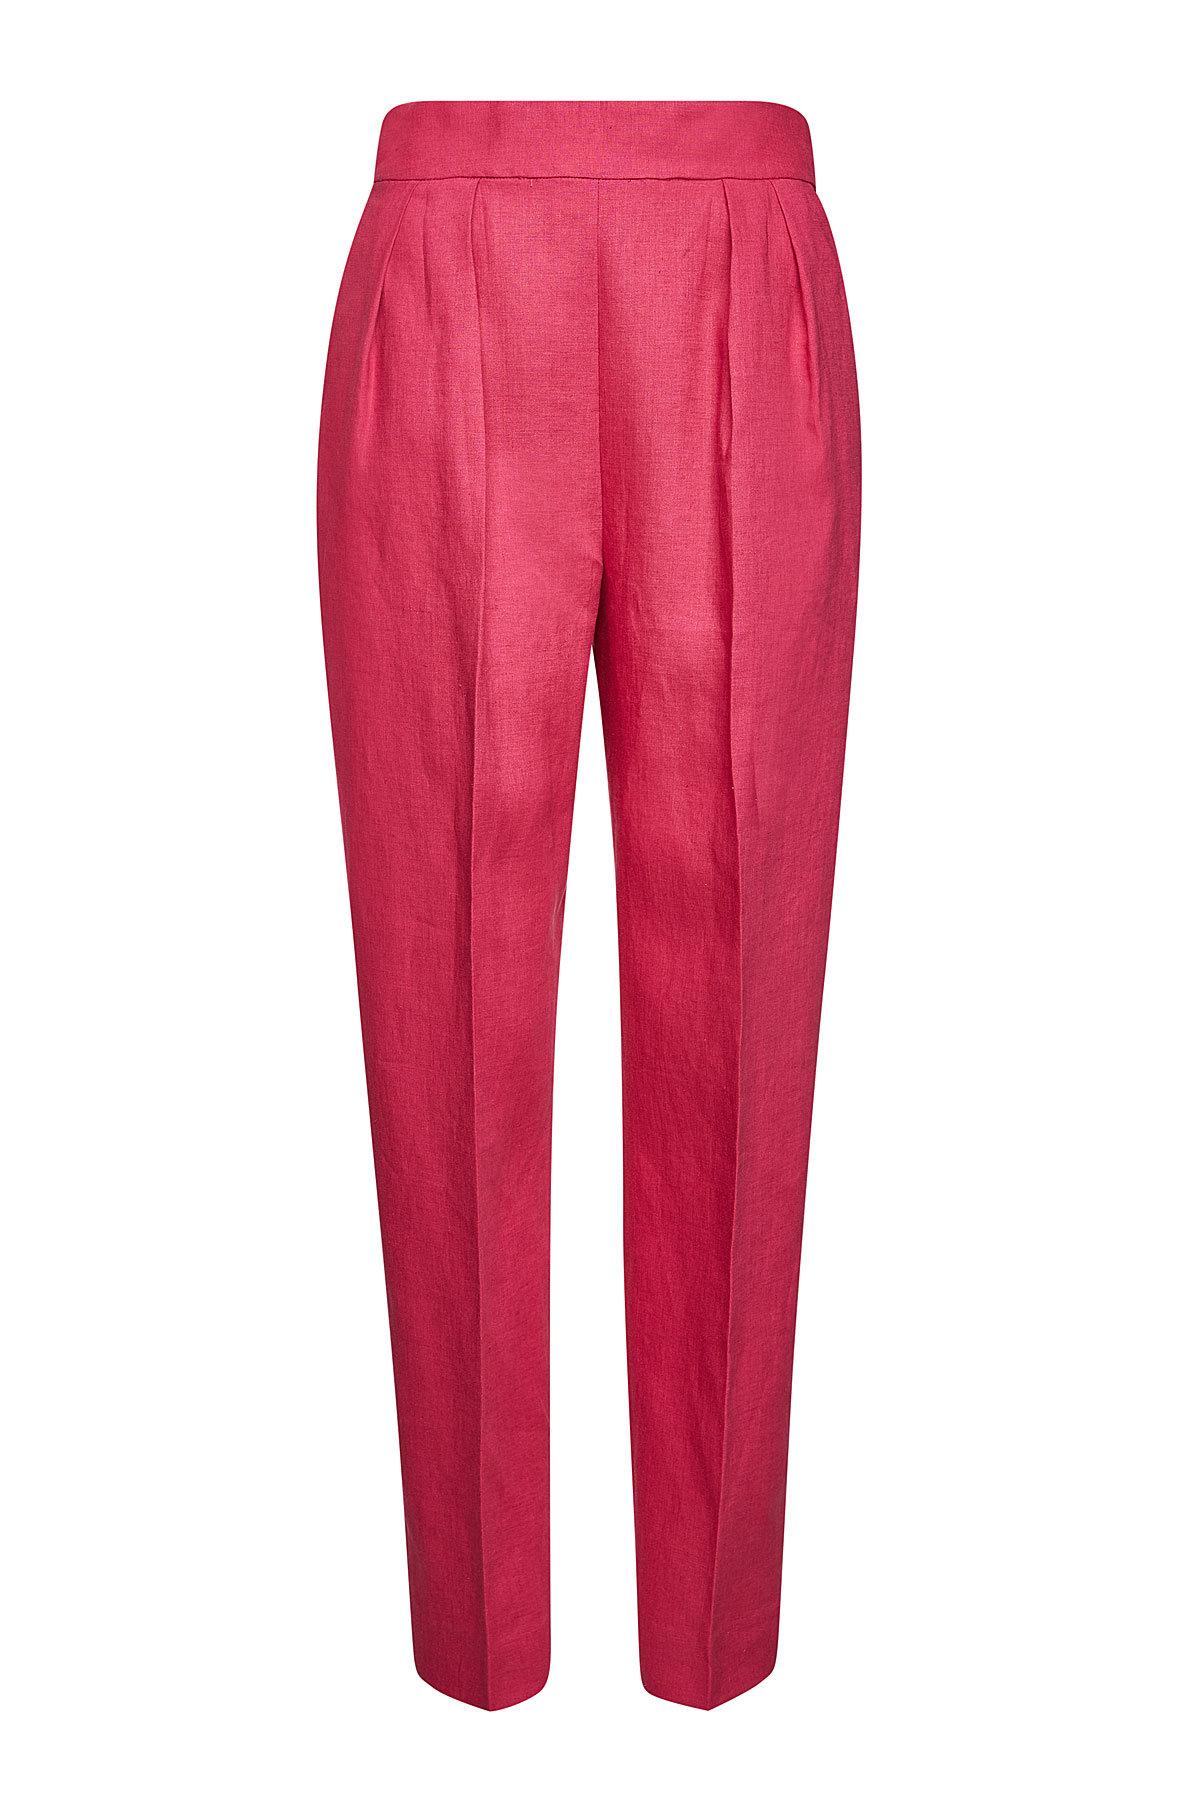 Theory - High Waisted Linen Pants